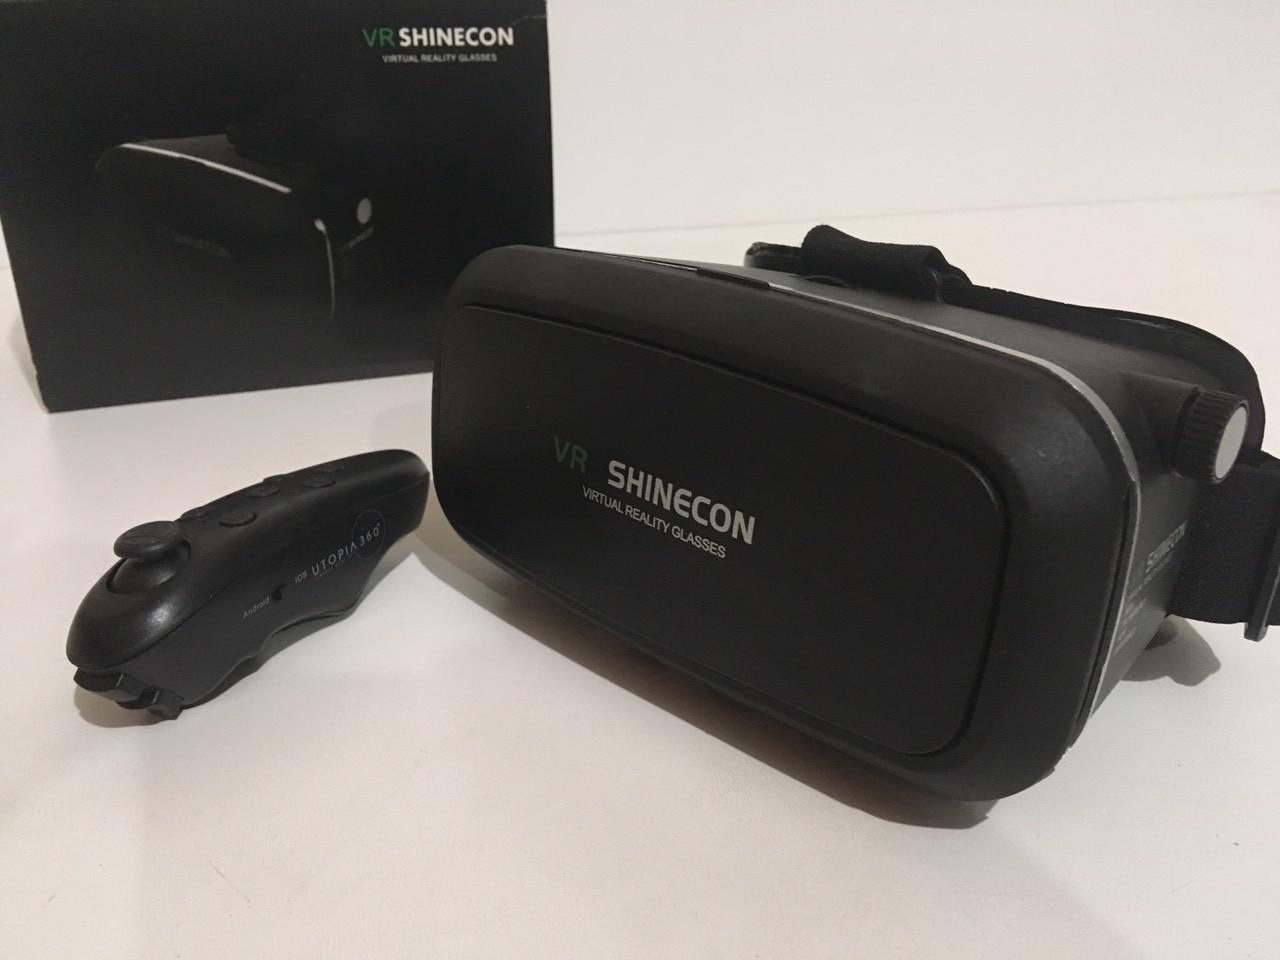 Очки виртуальной реальности с пультом VR BOX SHINECON VR-03 (20 шт/ящ)